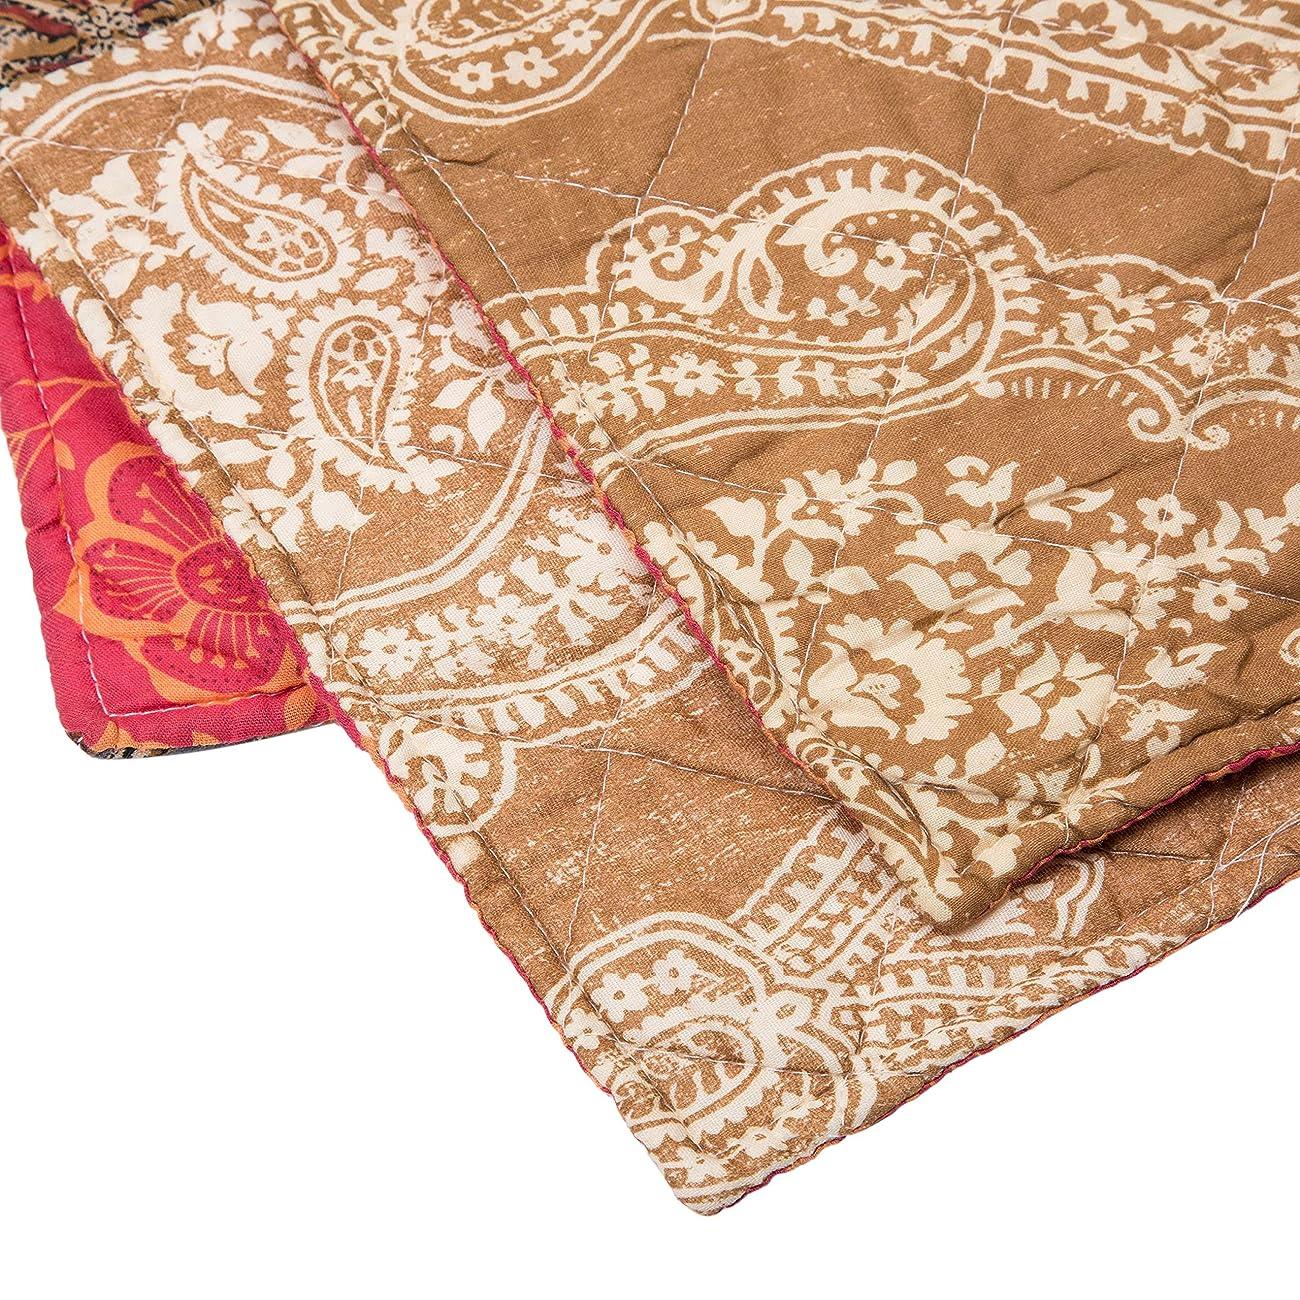 Luxury Retro Floral Stitching Cotton Patchwork Bedspread Sets Quilt Queen Size 5